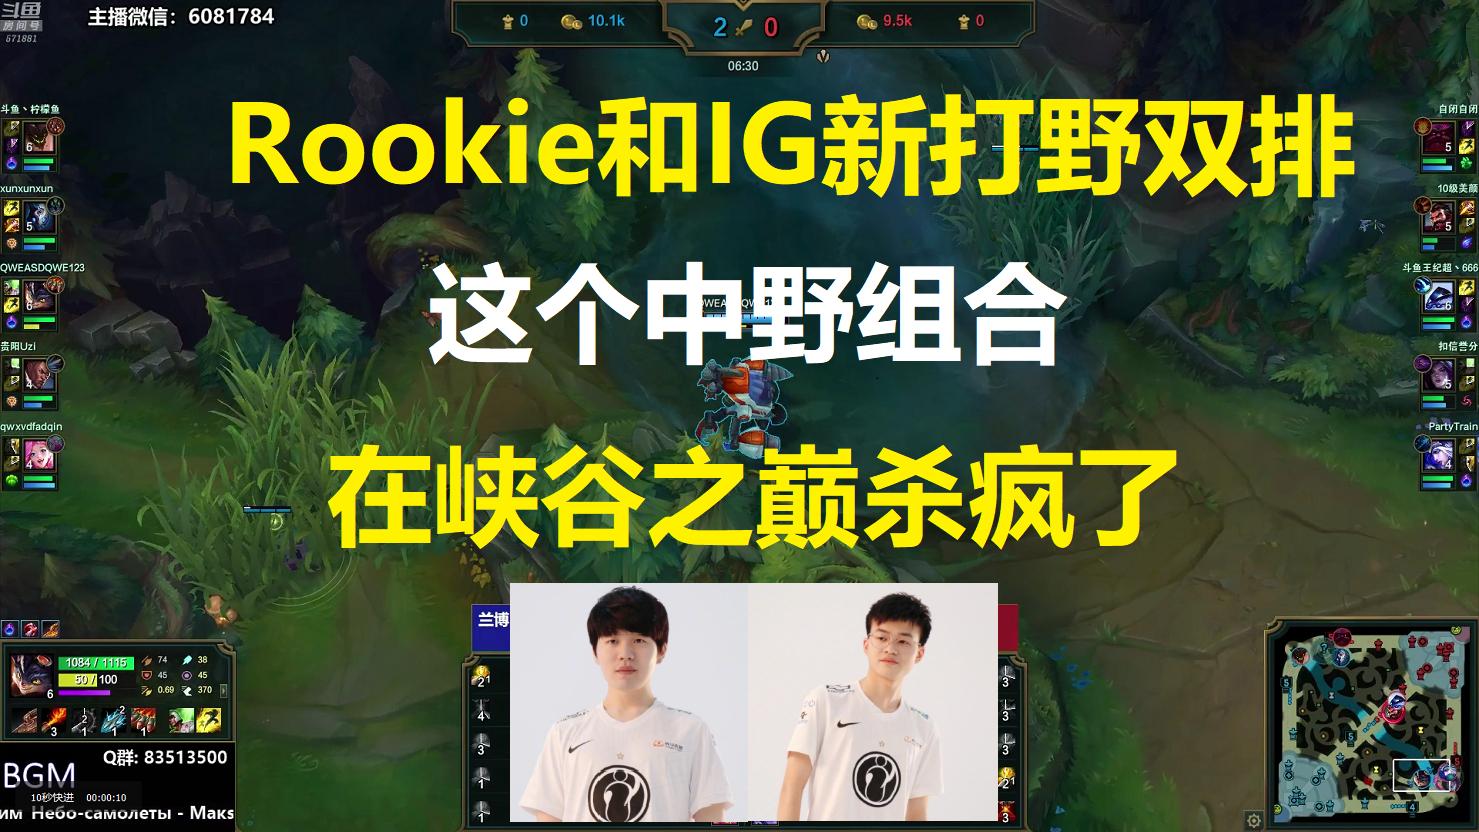 Rookie和IG新打野Xun双排,这个中野组合,在峡谷之巅杀疯了呀!